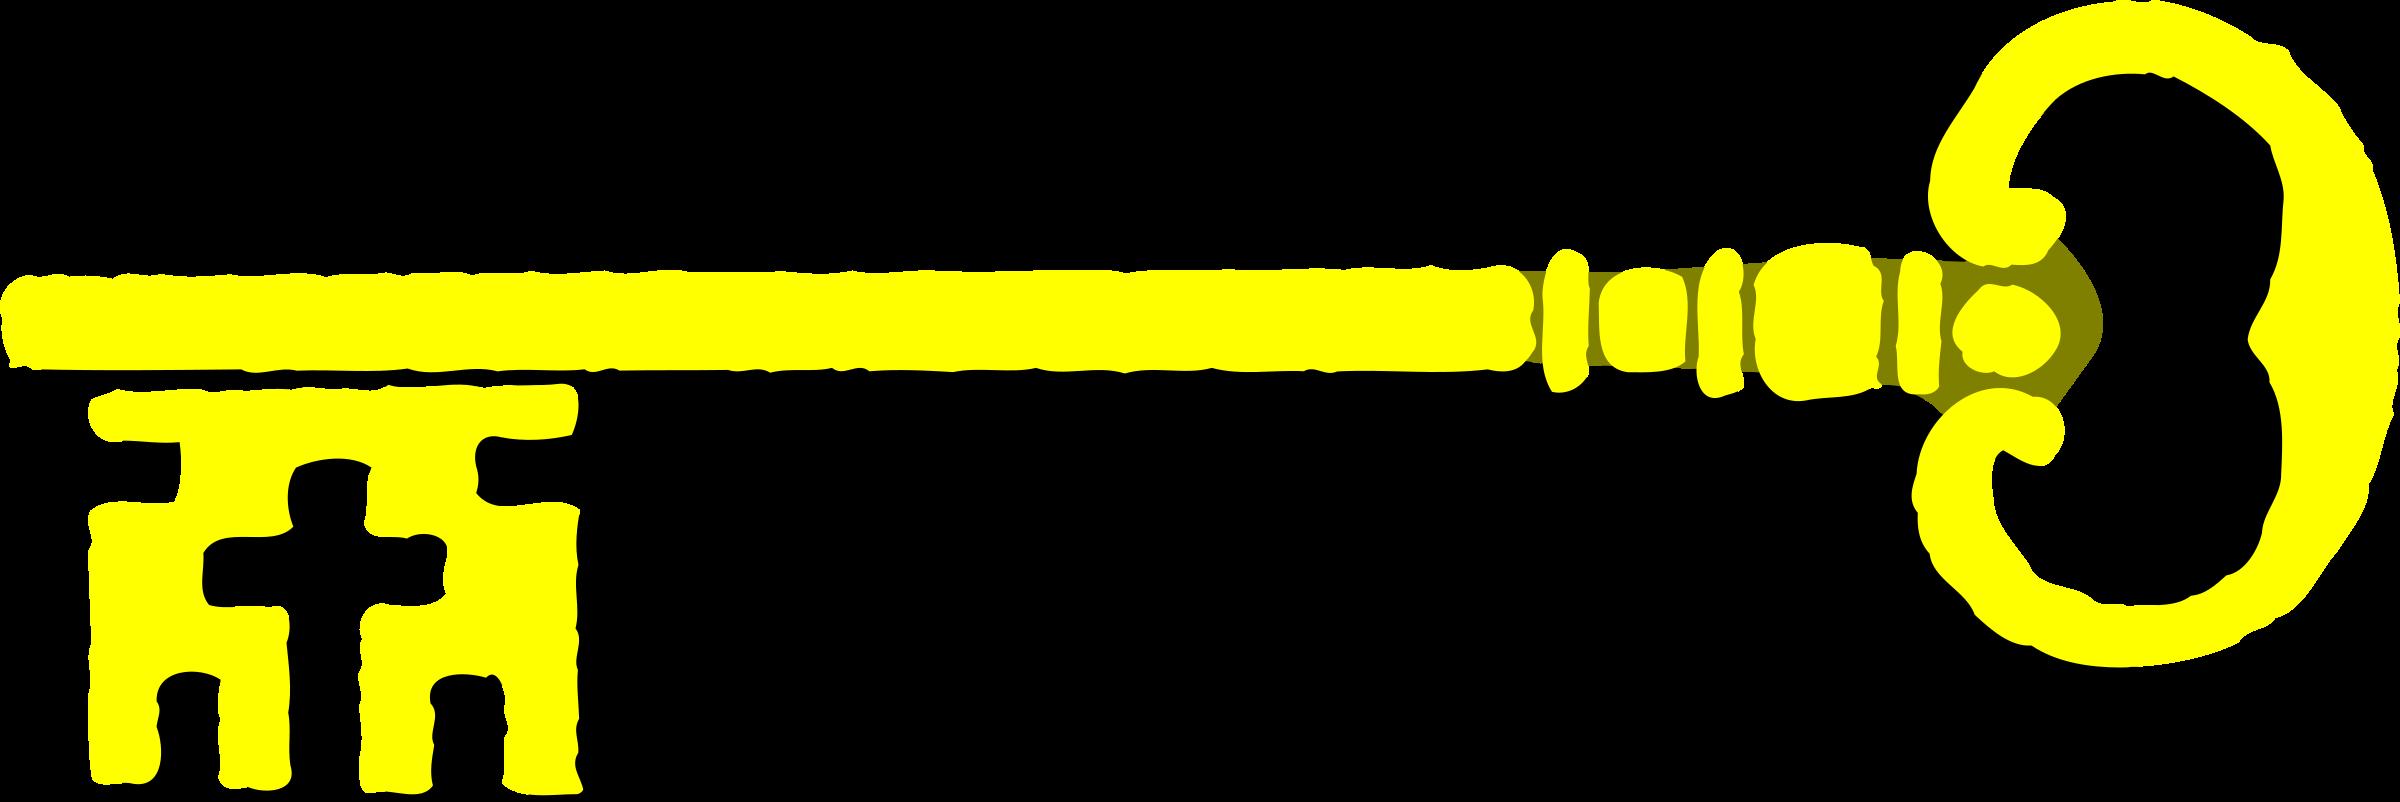 Keys victorian key